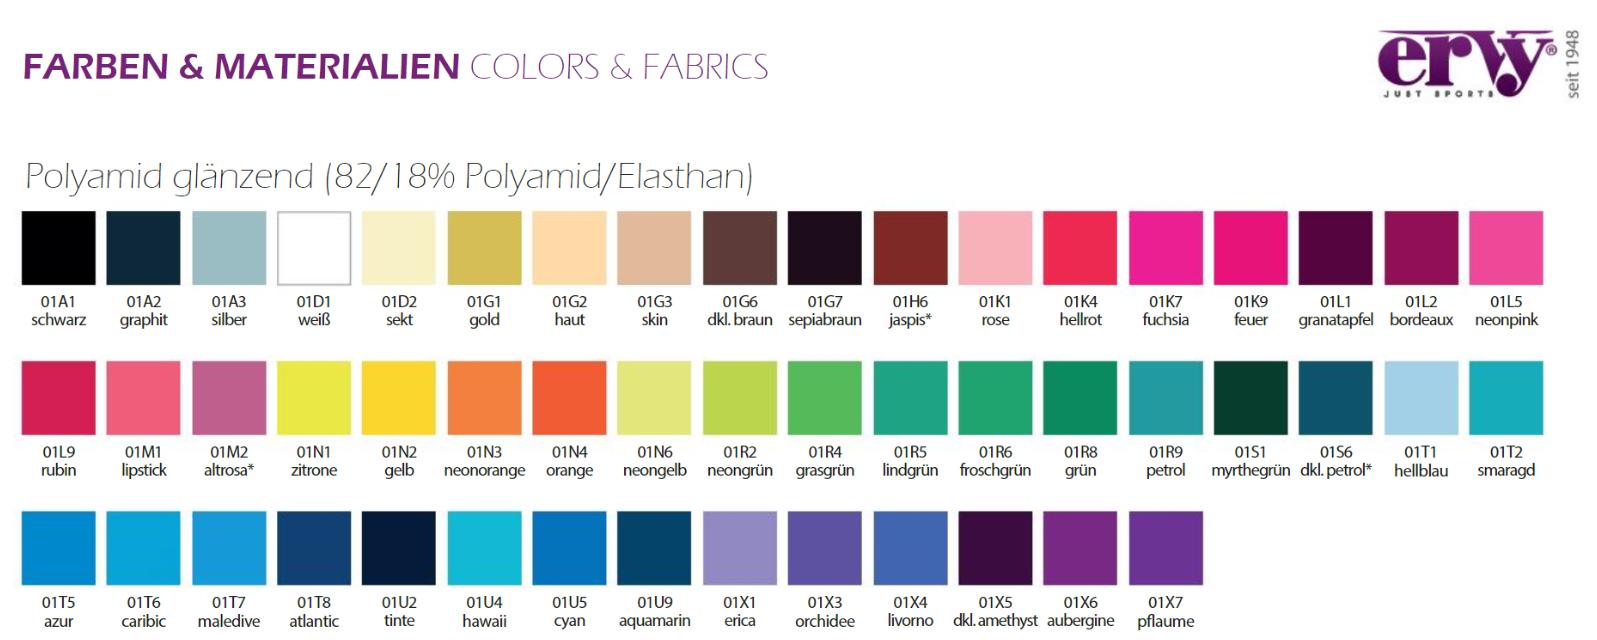 Polyamid Glänzend colors